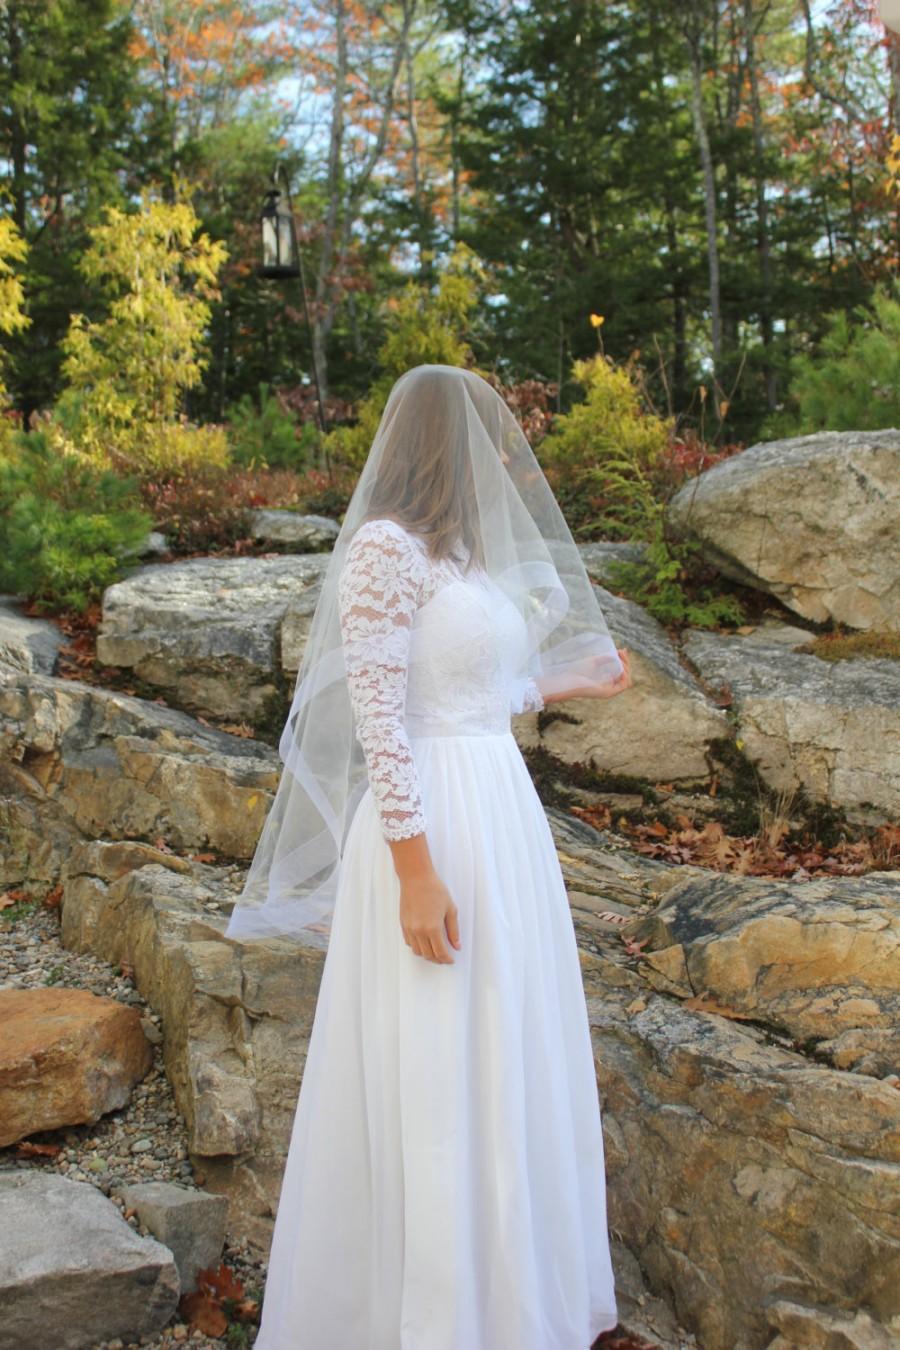 Hochzeit - 2 Inch Horsehair Veil, Cathedral Veil, HorseHair Edge Veil, Blusher Veil, Drop Veil, Champagne Veil, Ivory Veil, White Veil, READY TO SHIP